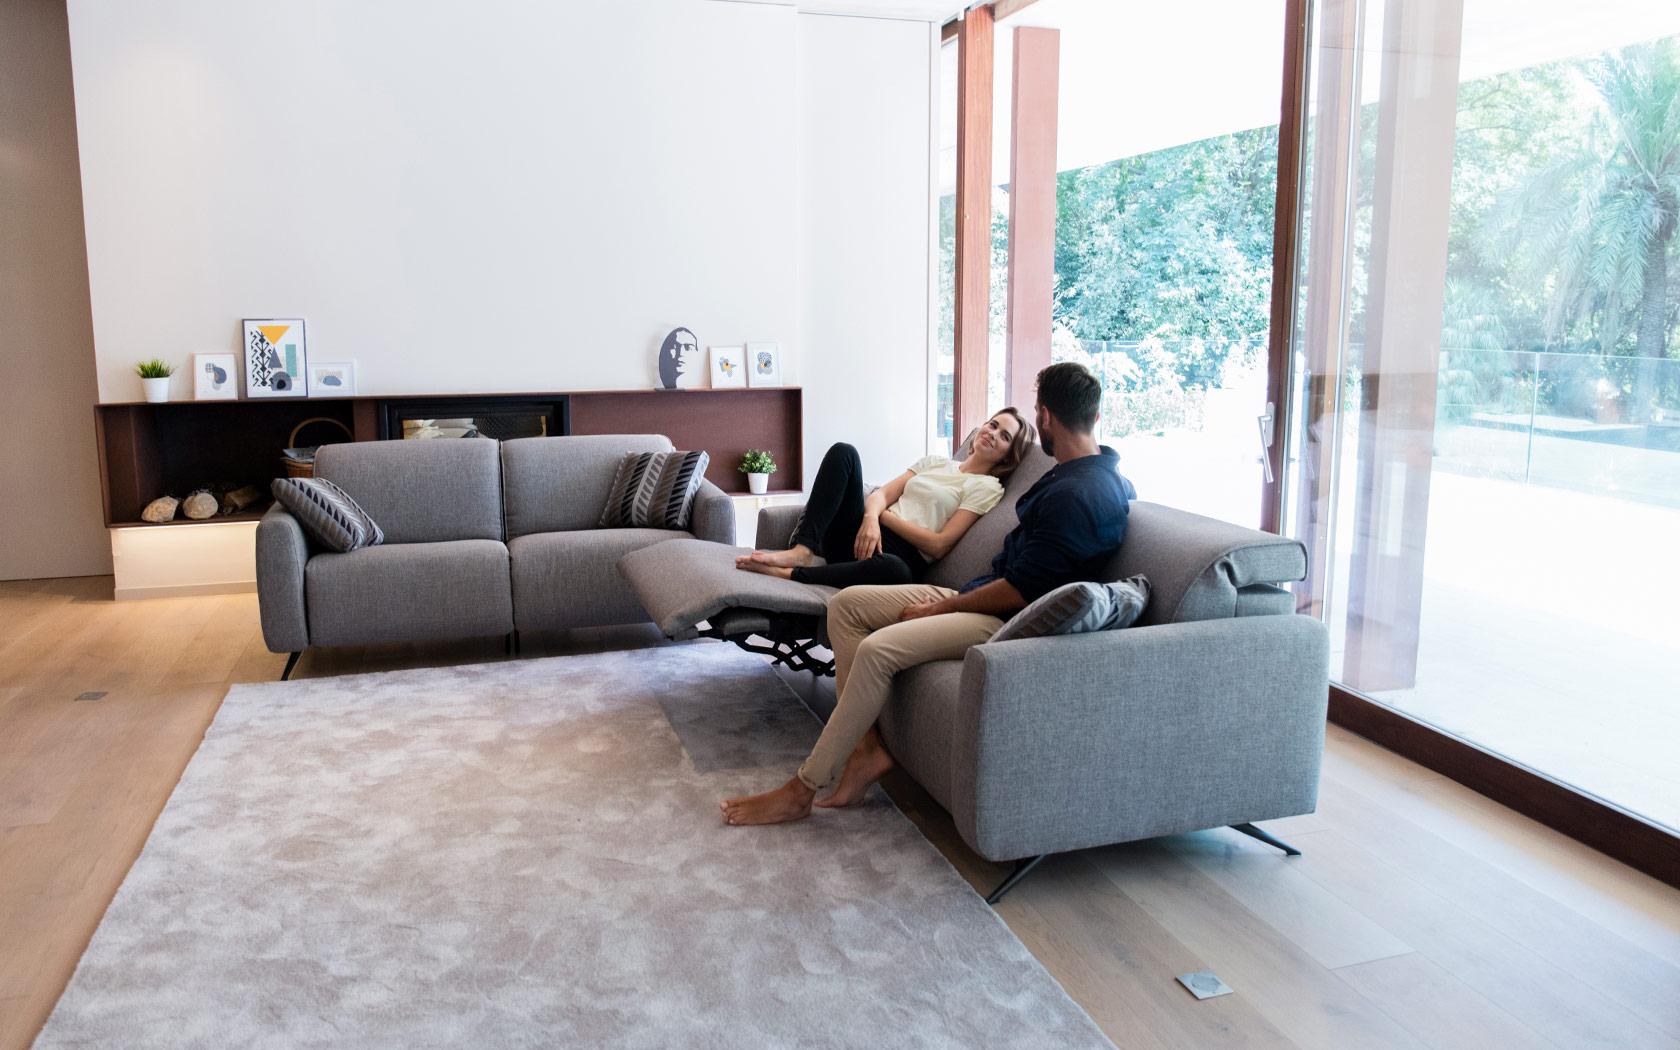 Baltia sofa relax 2020 04